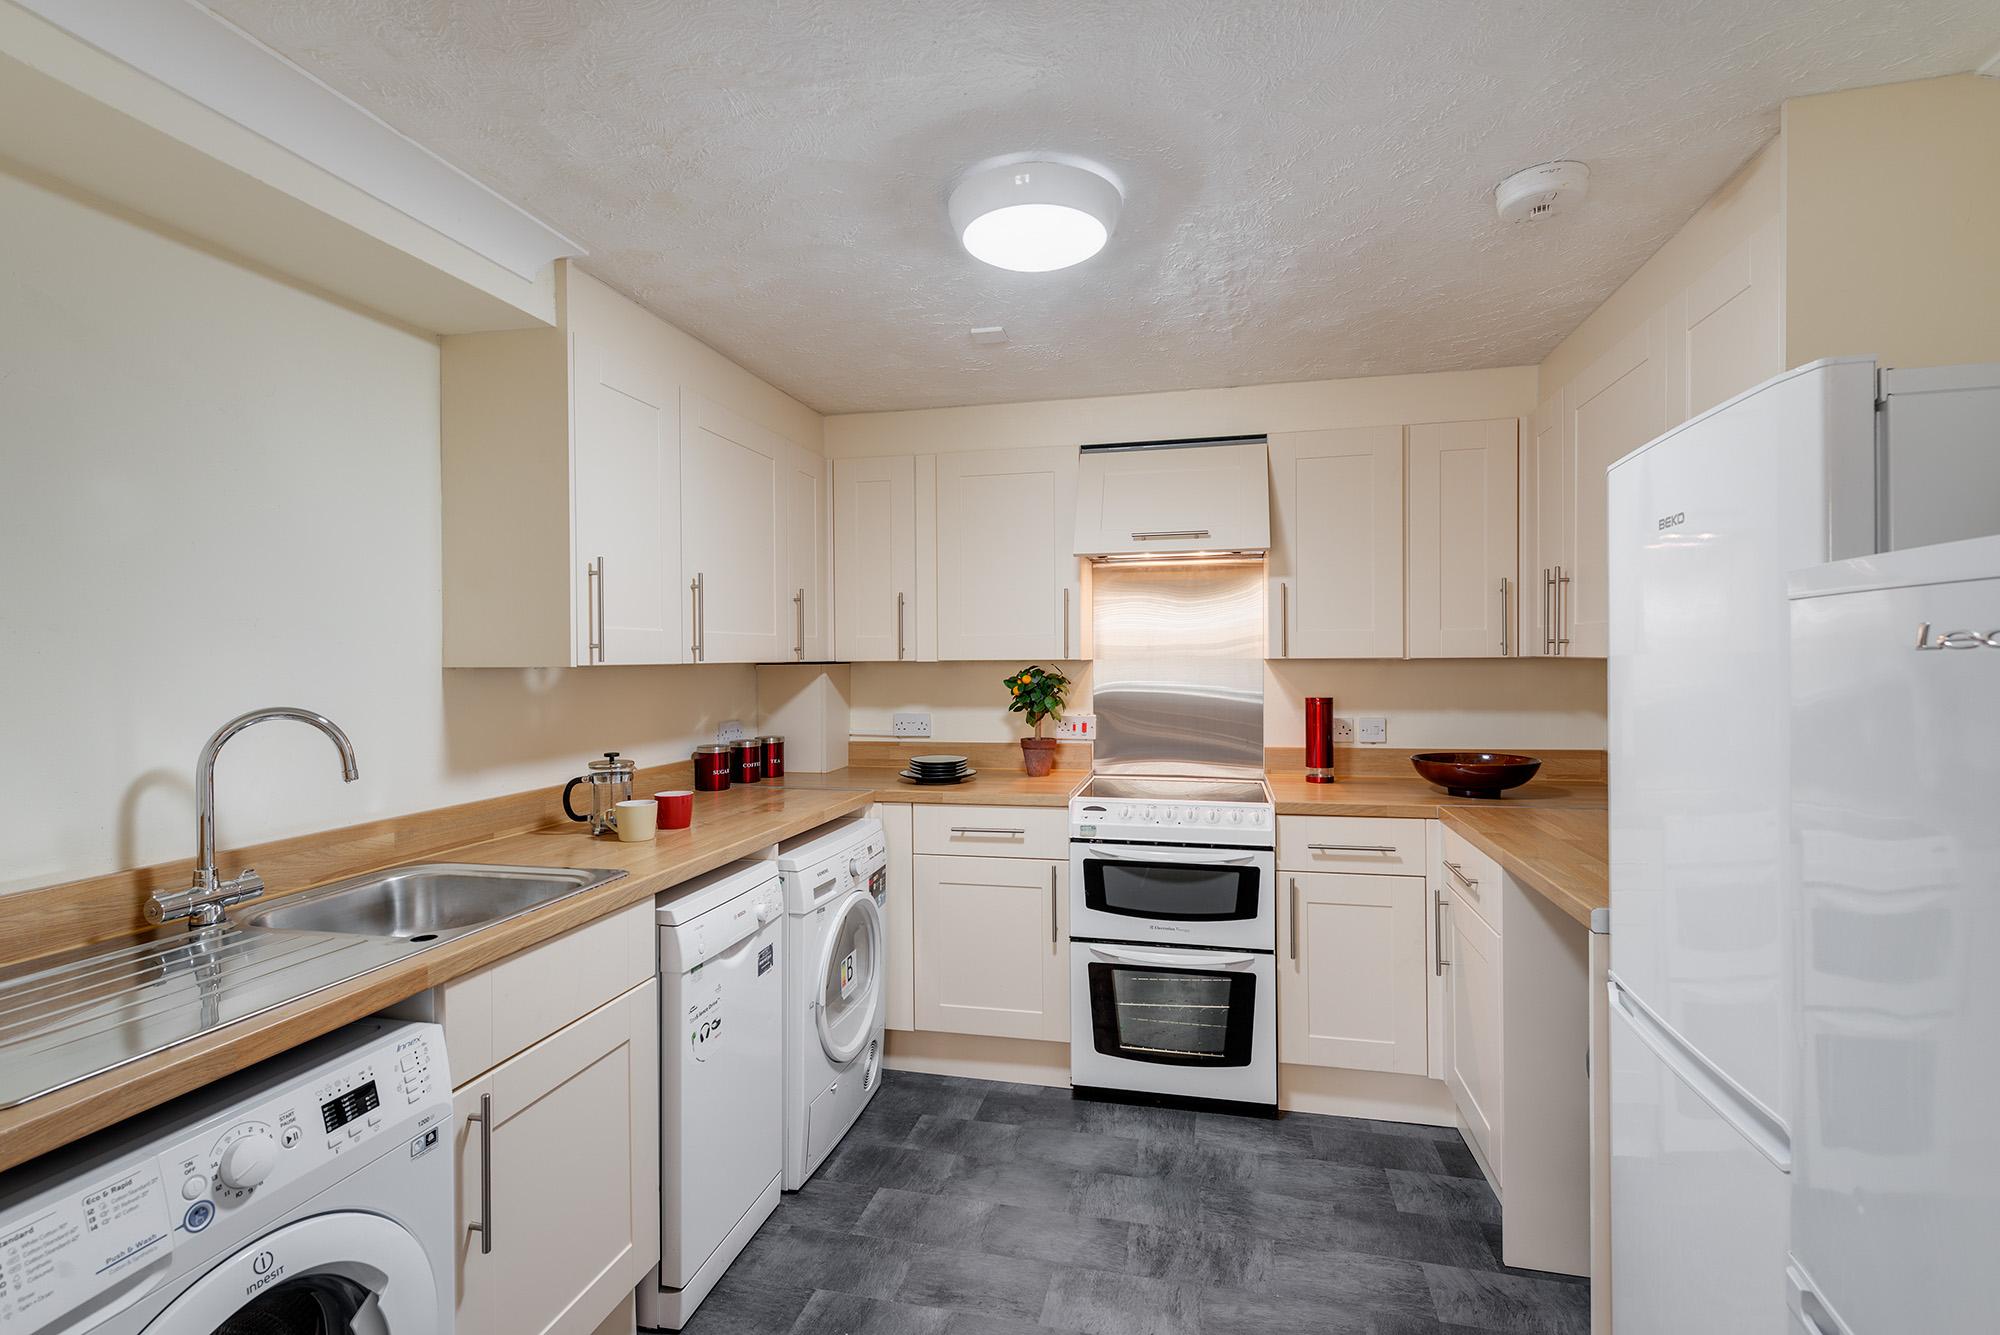 Brunel Student Kitchen